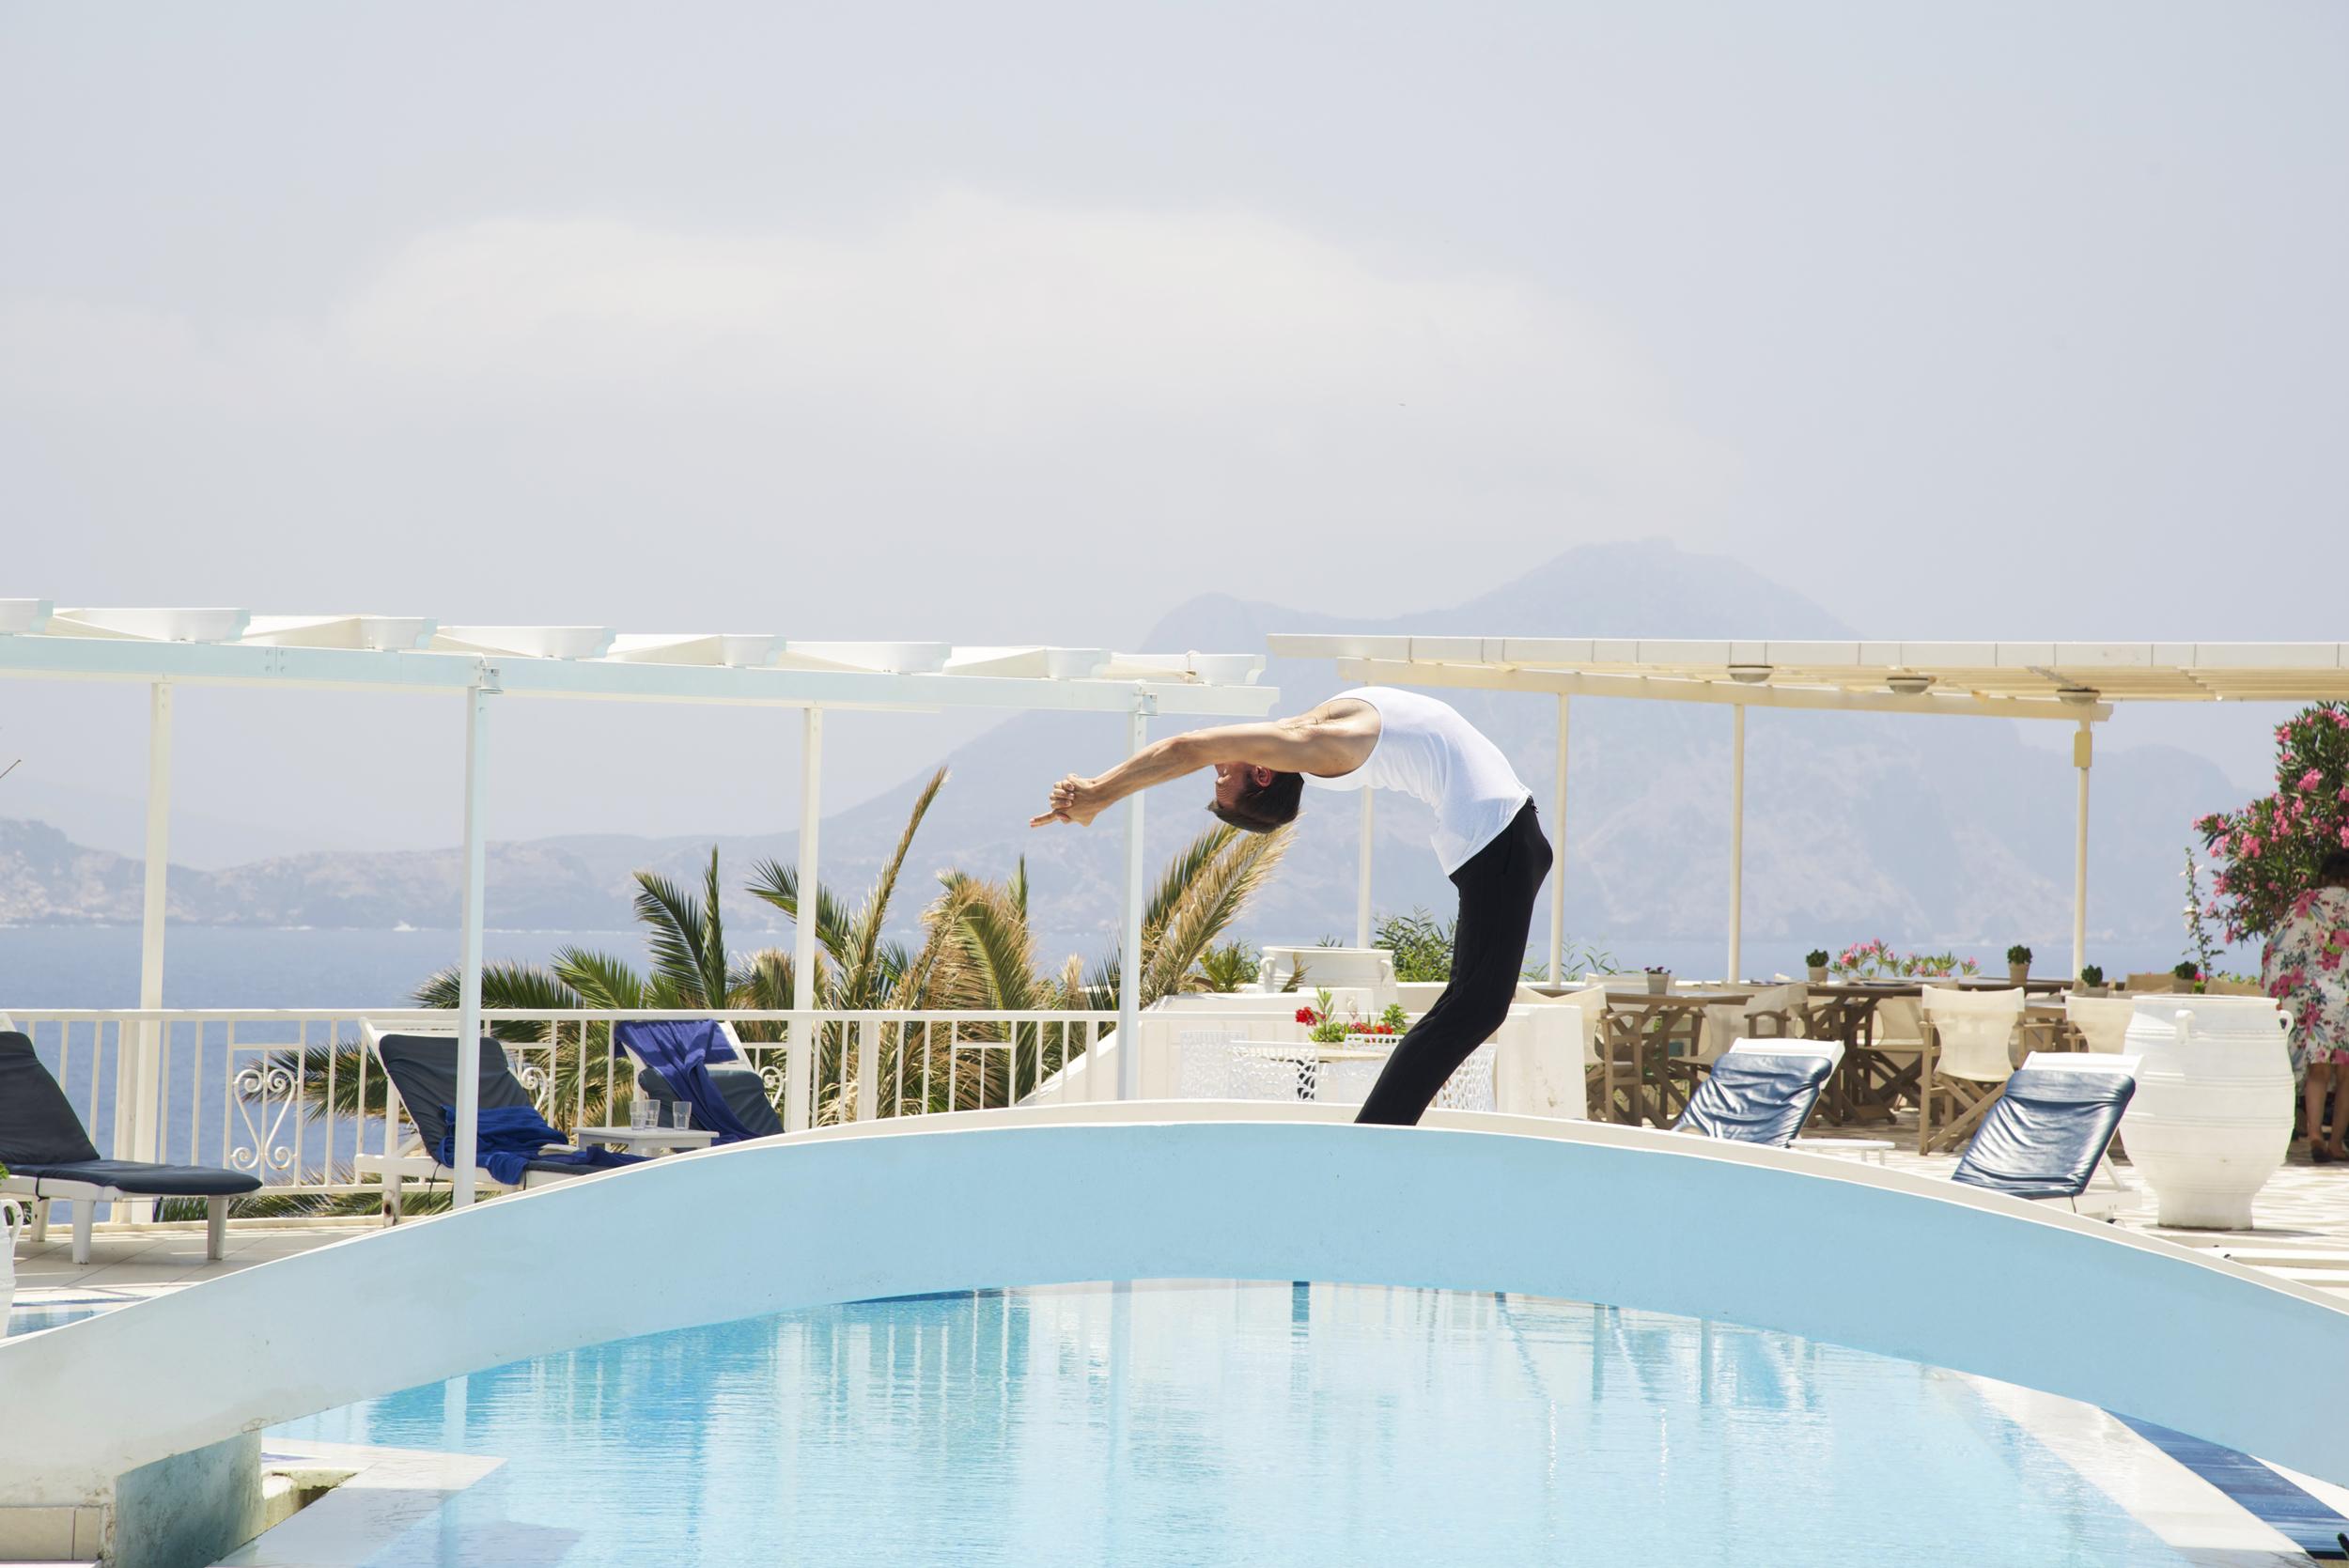 Garth - Dropback - Greece.jpg